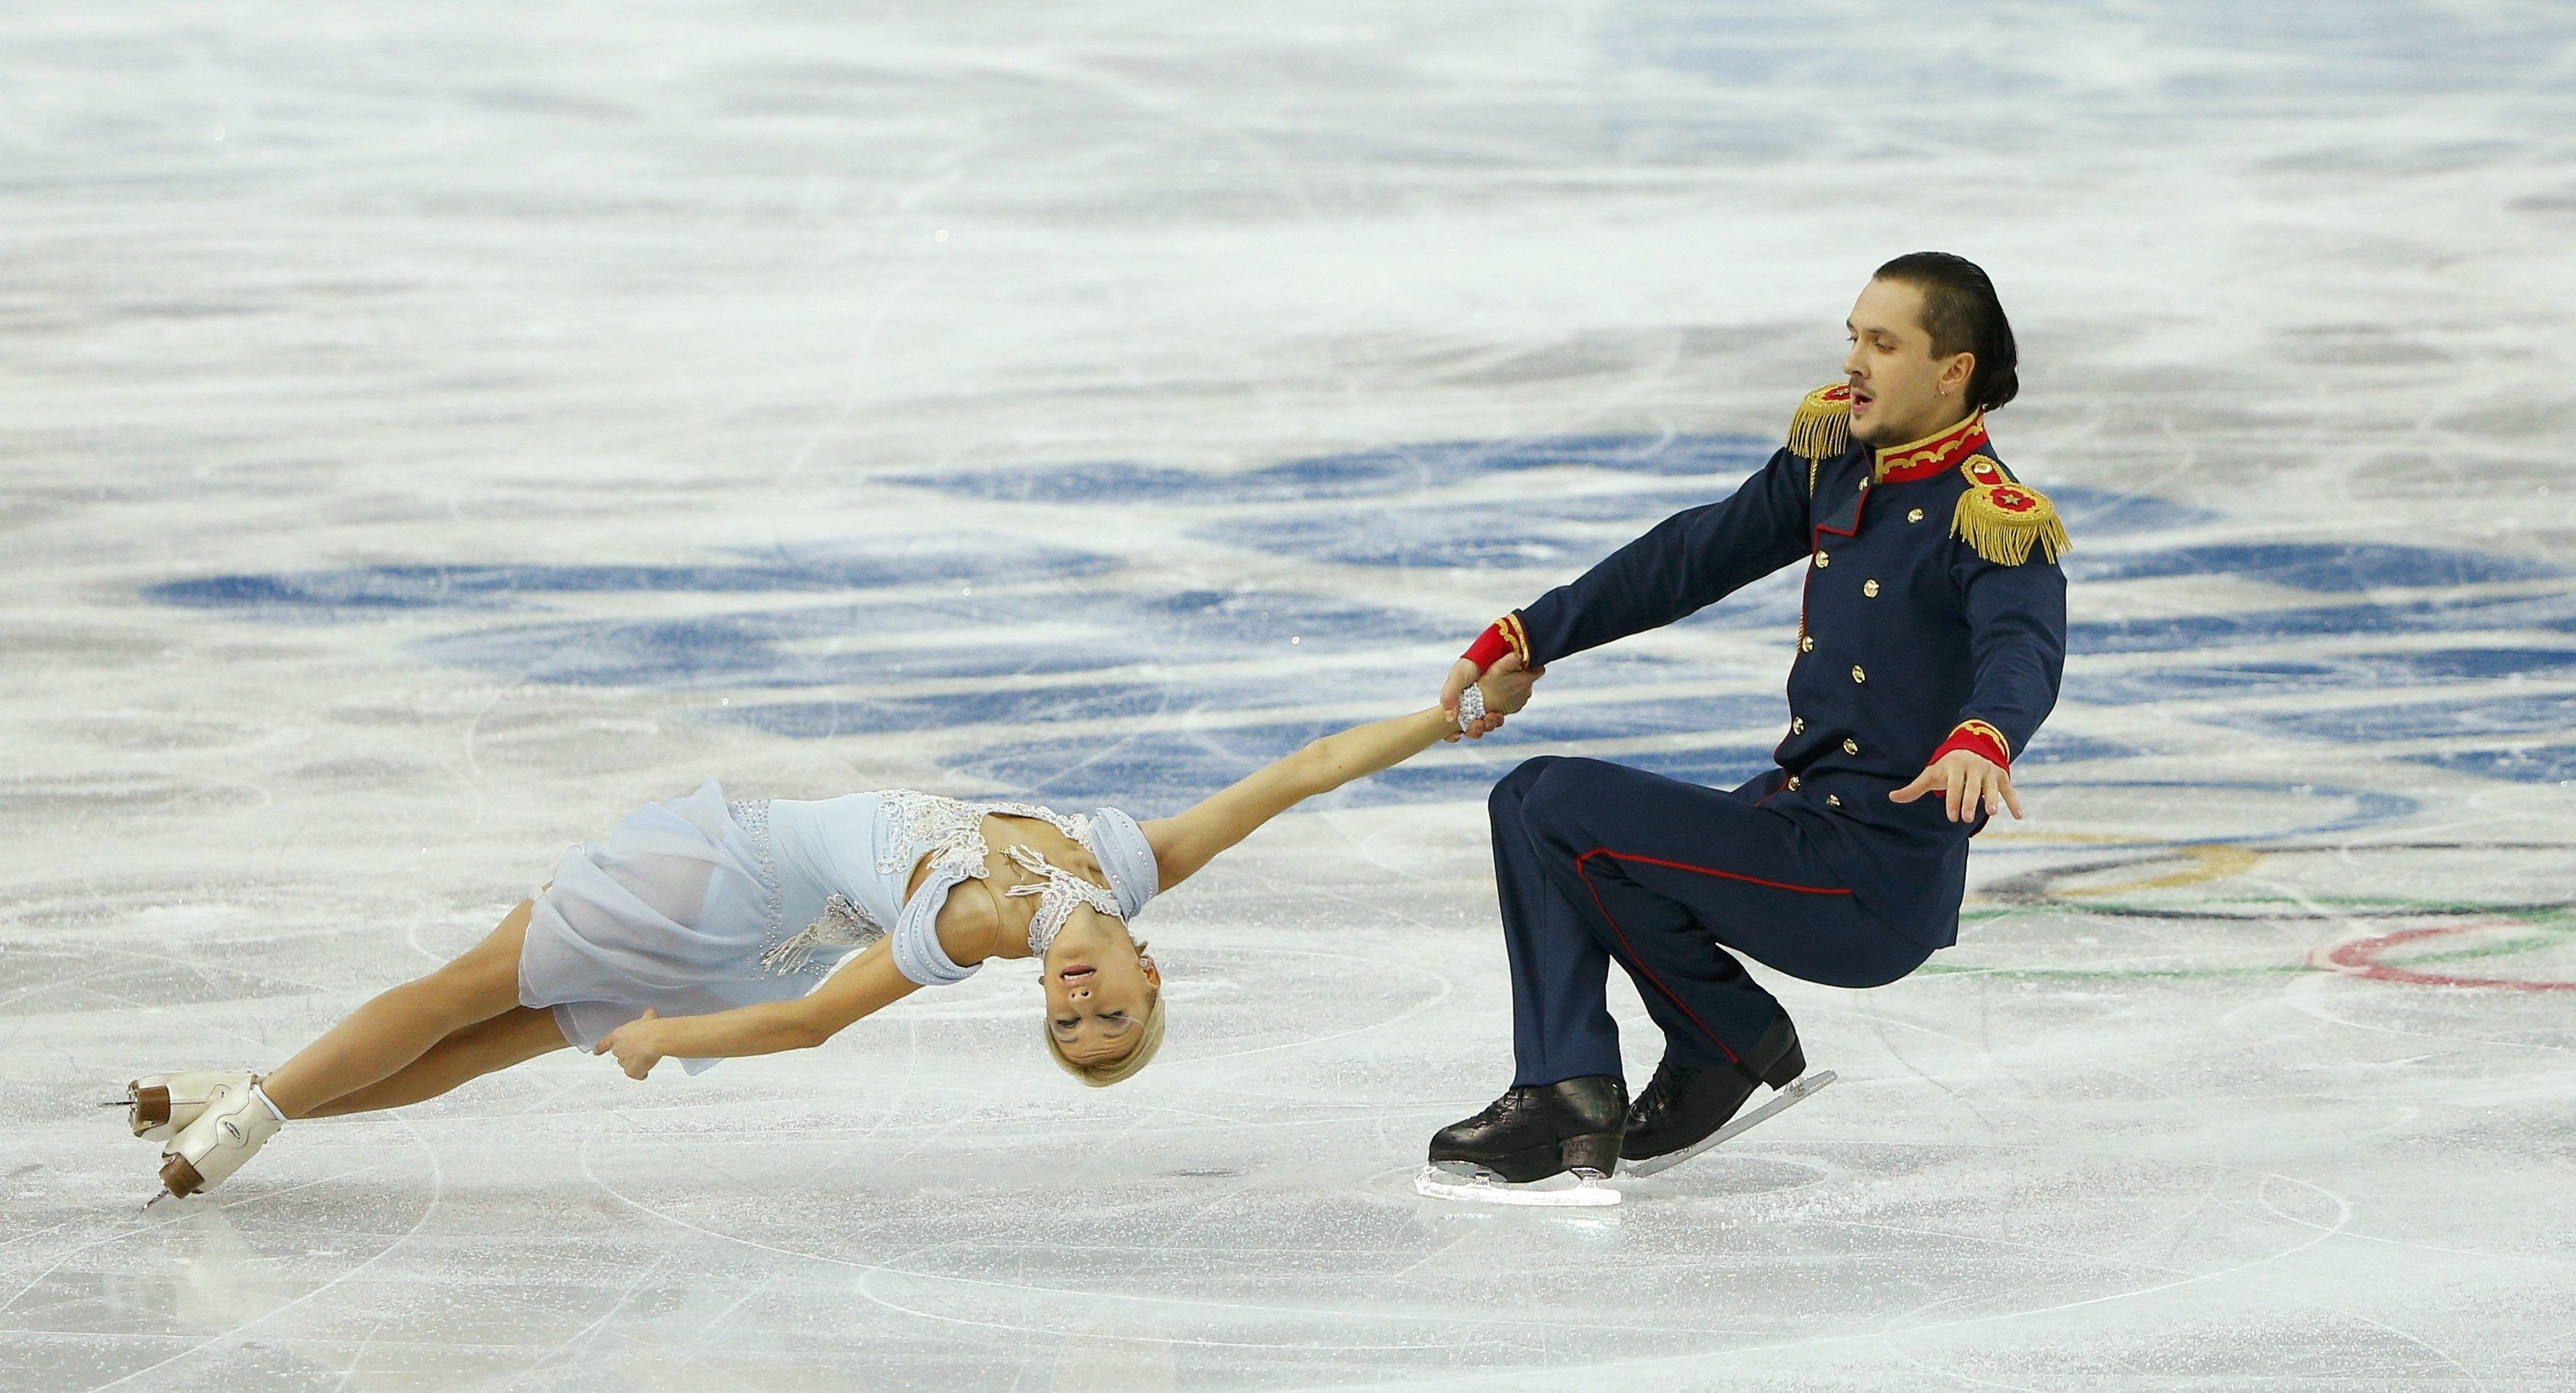 Res: 3500x1893, Figure-Skating-Wallpaper-gorgerous-figure-skating-wallpaper--